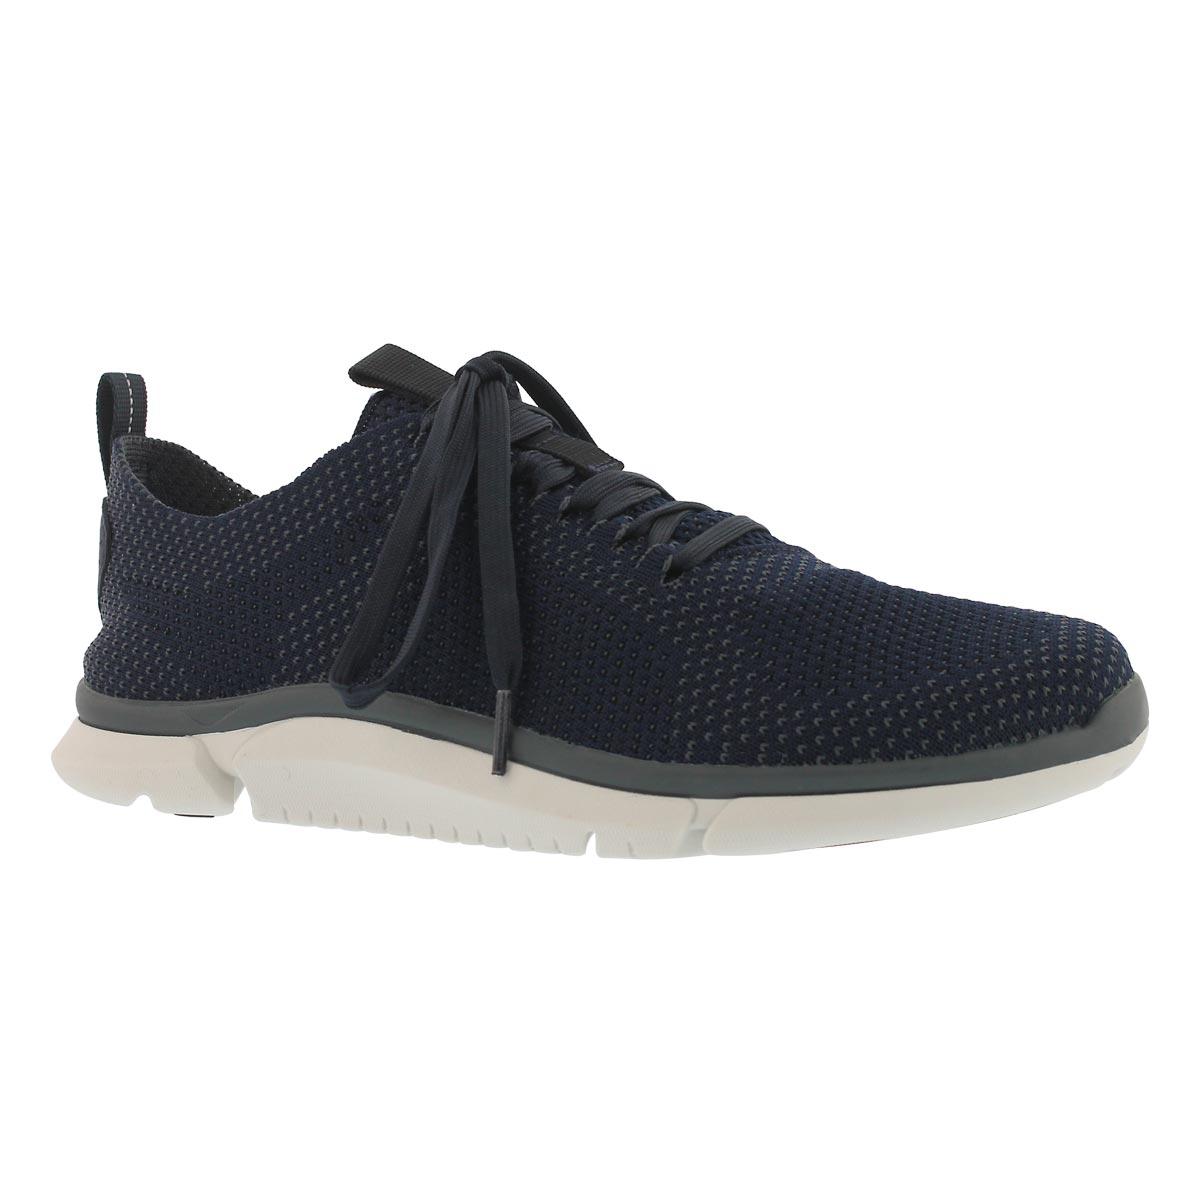 Men's TRIKEN RUN navy lace up sneaker